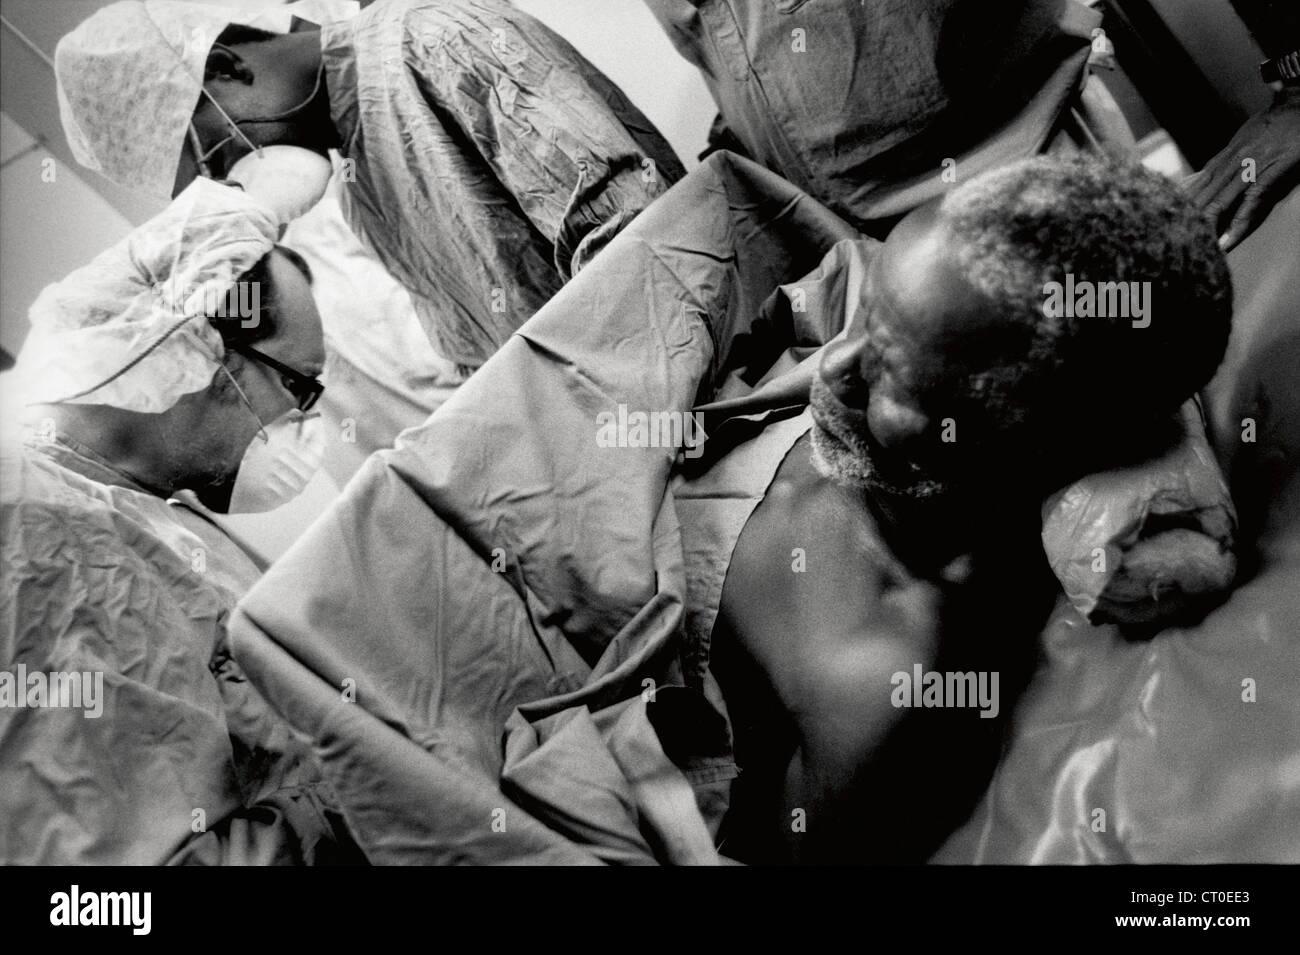 MEDECINE TCHAD - Stock Image